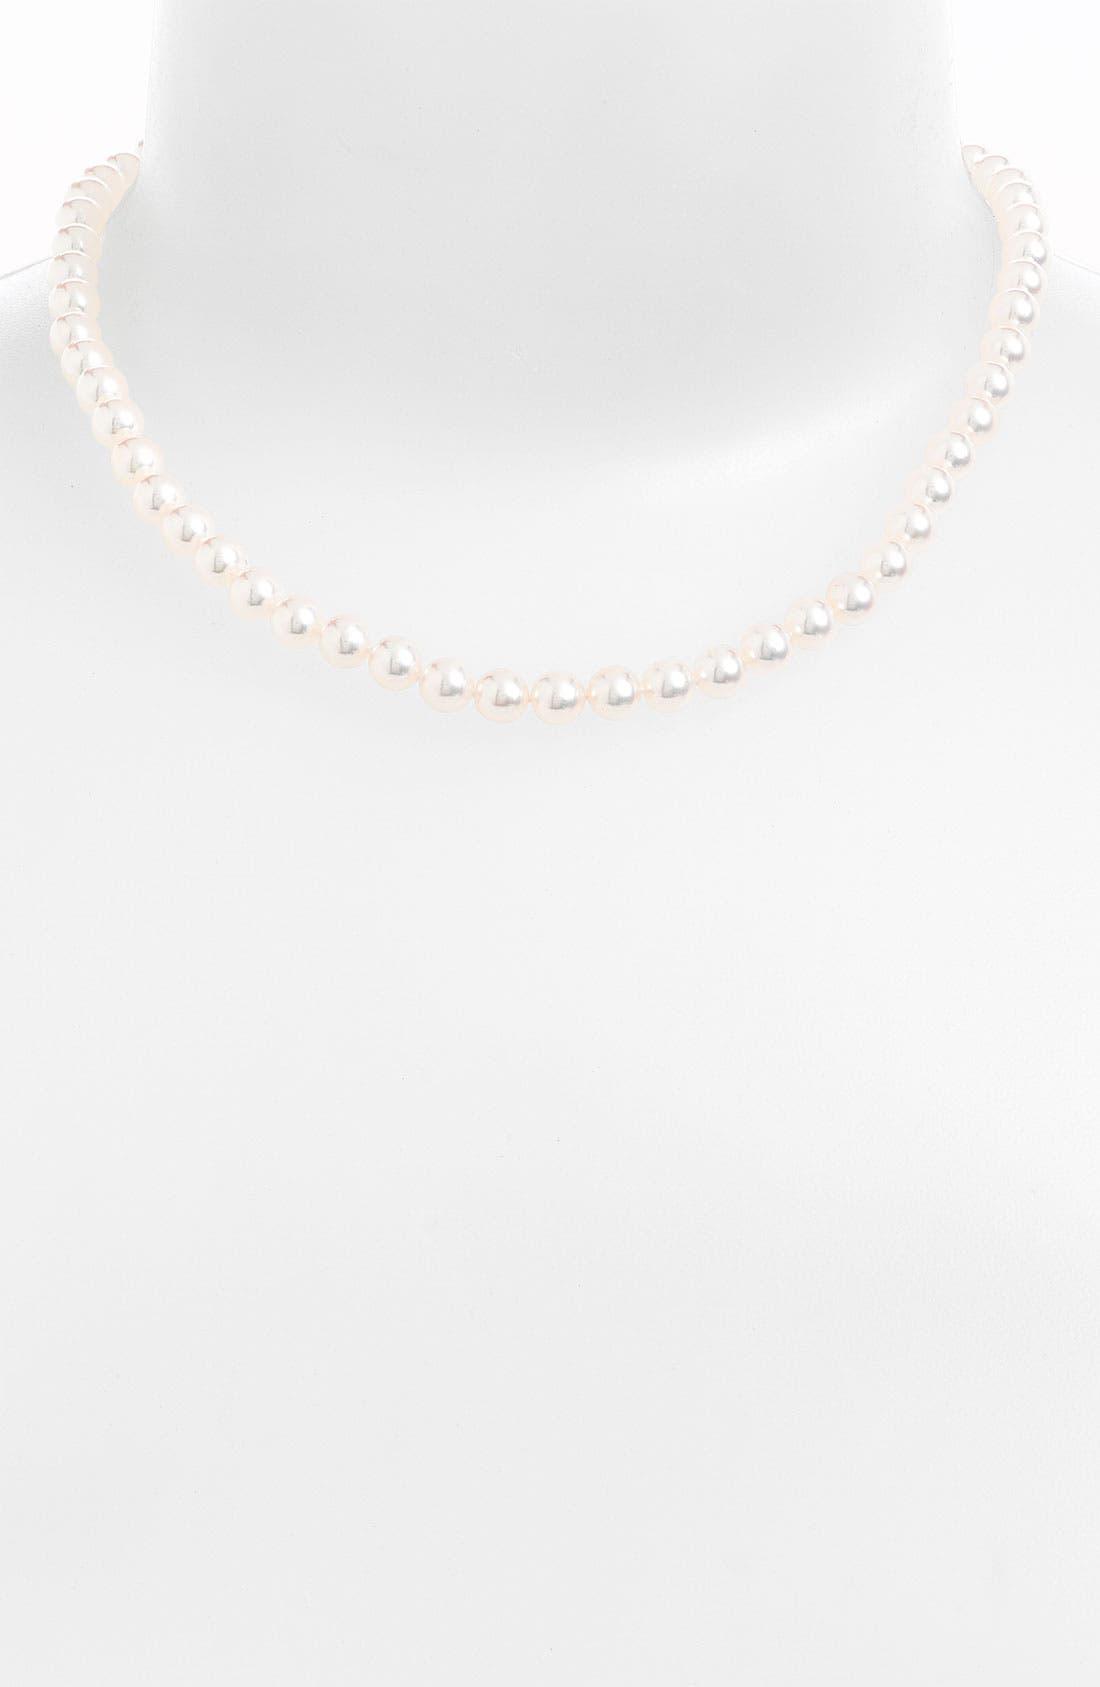 Alternate Image 1 Selected - Mikimoto Akoya Pearl Choker Necklace